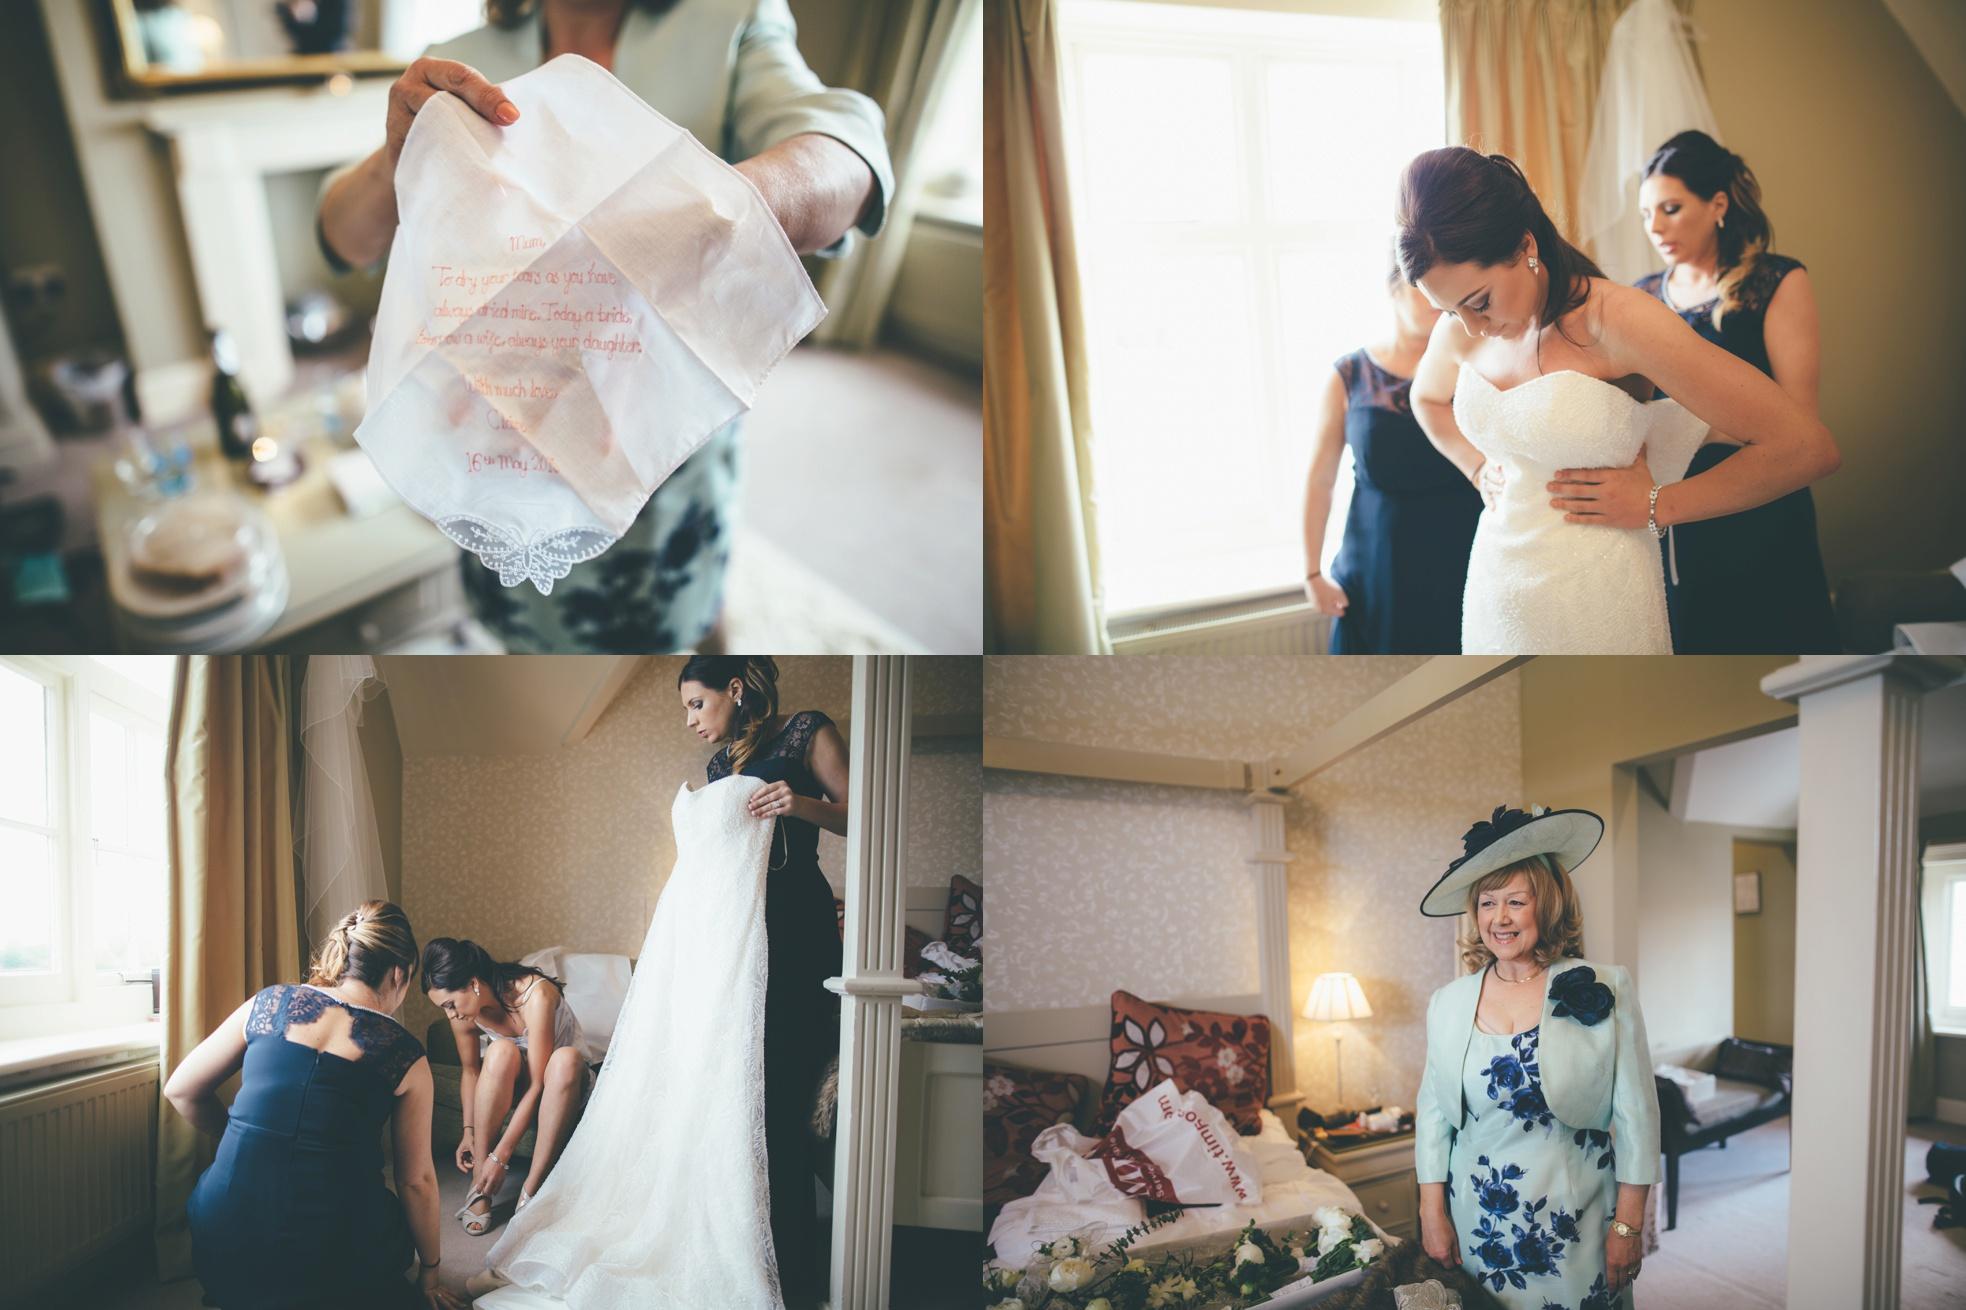 ClaireKieranwedding_PrestonCourtCanterbury_0003.jpg